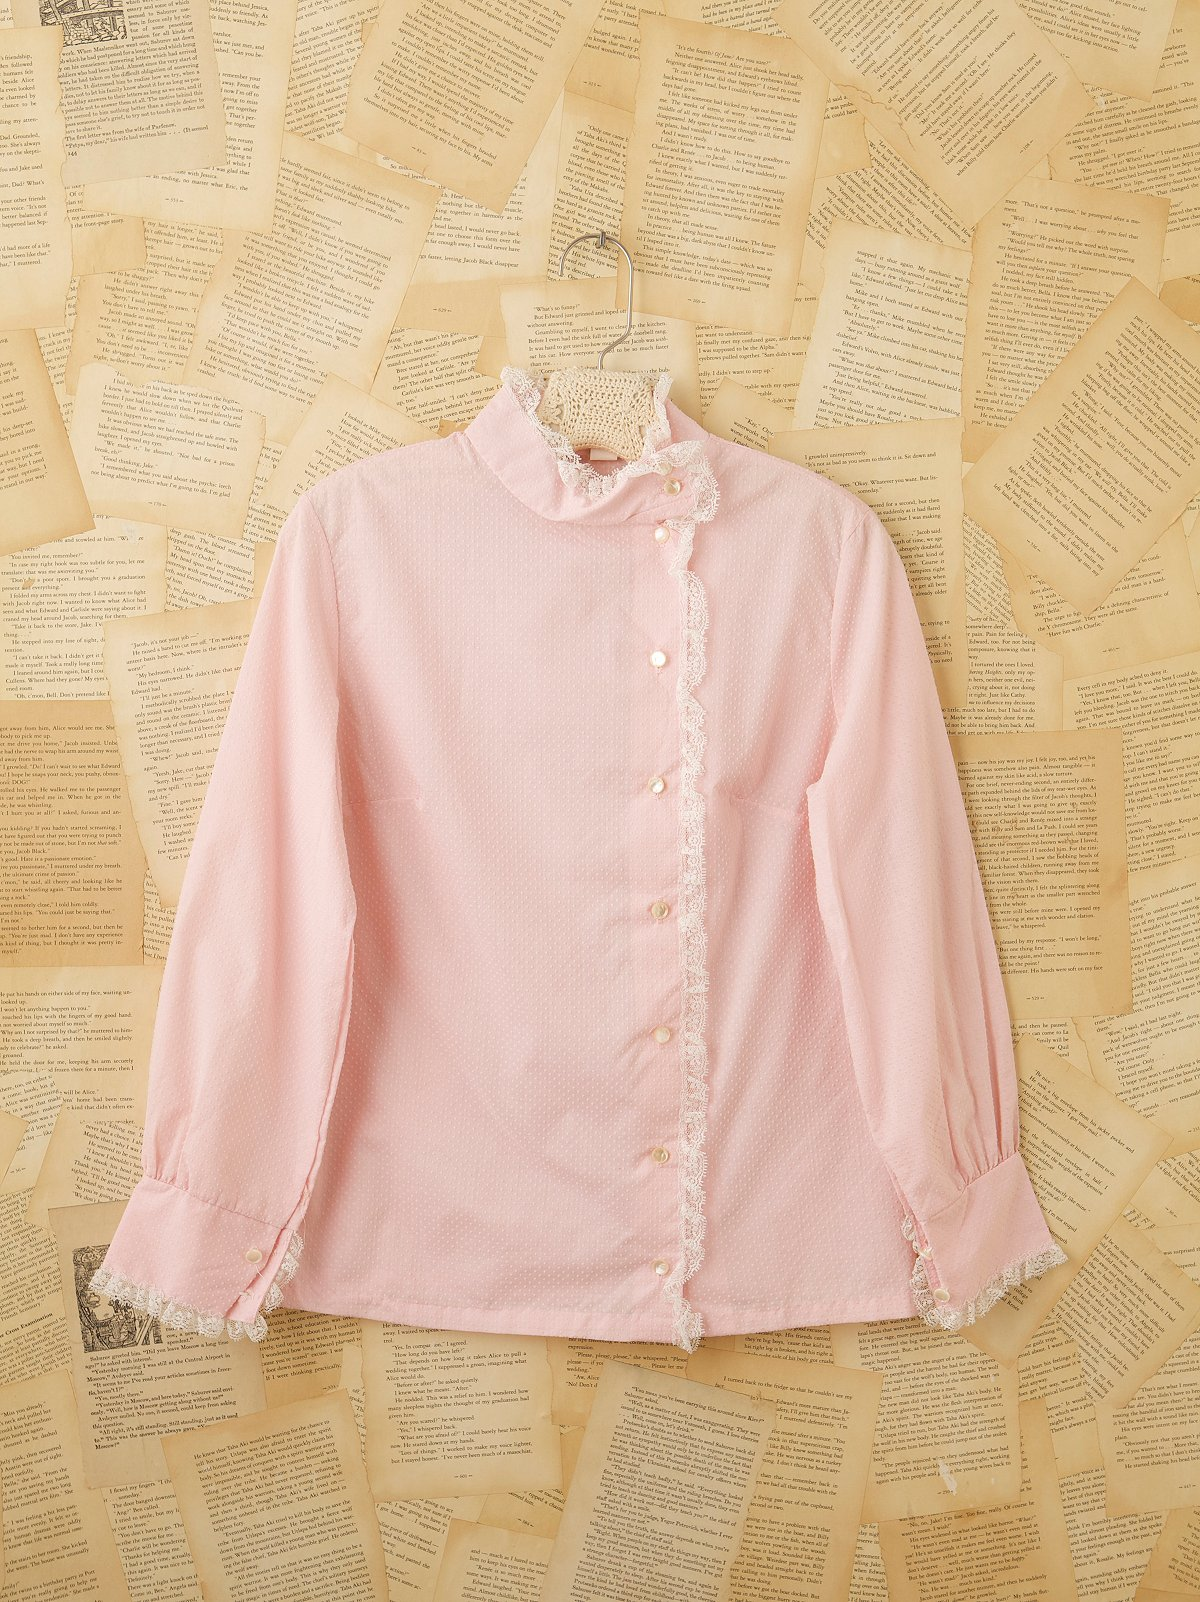 Vintage 1950s Pink Swiss Dot Blouse